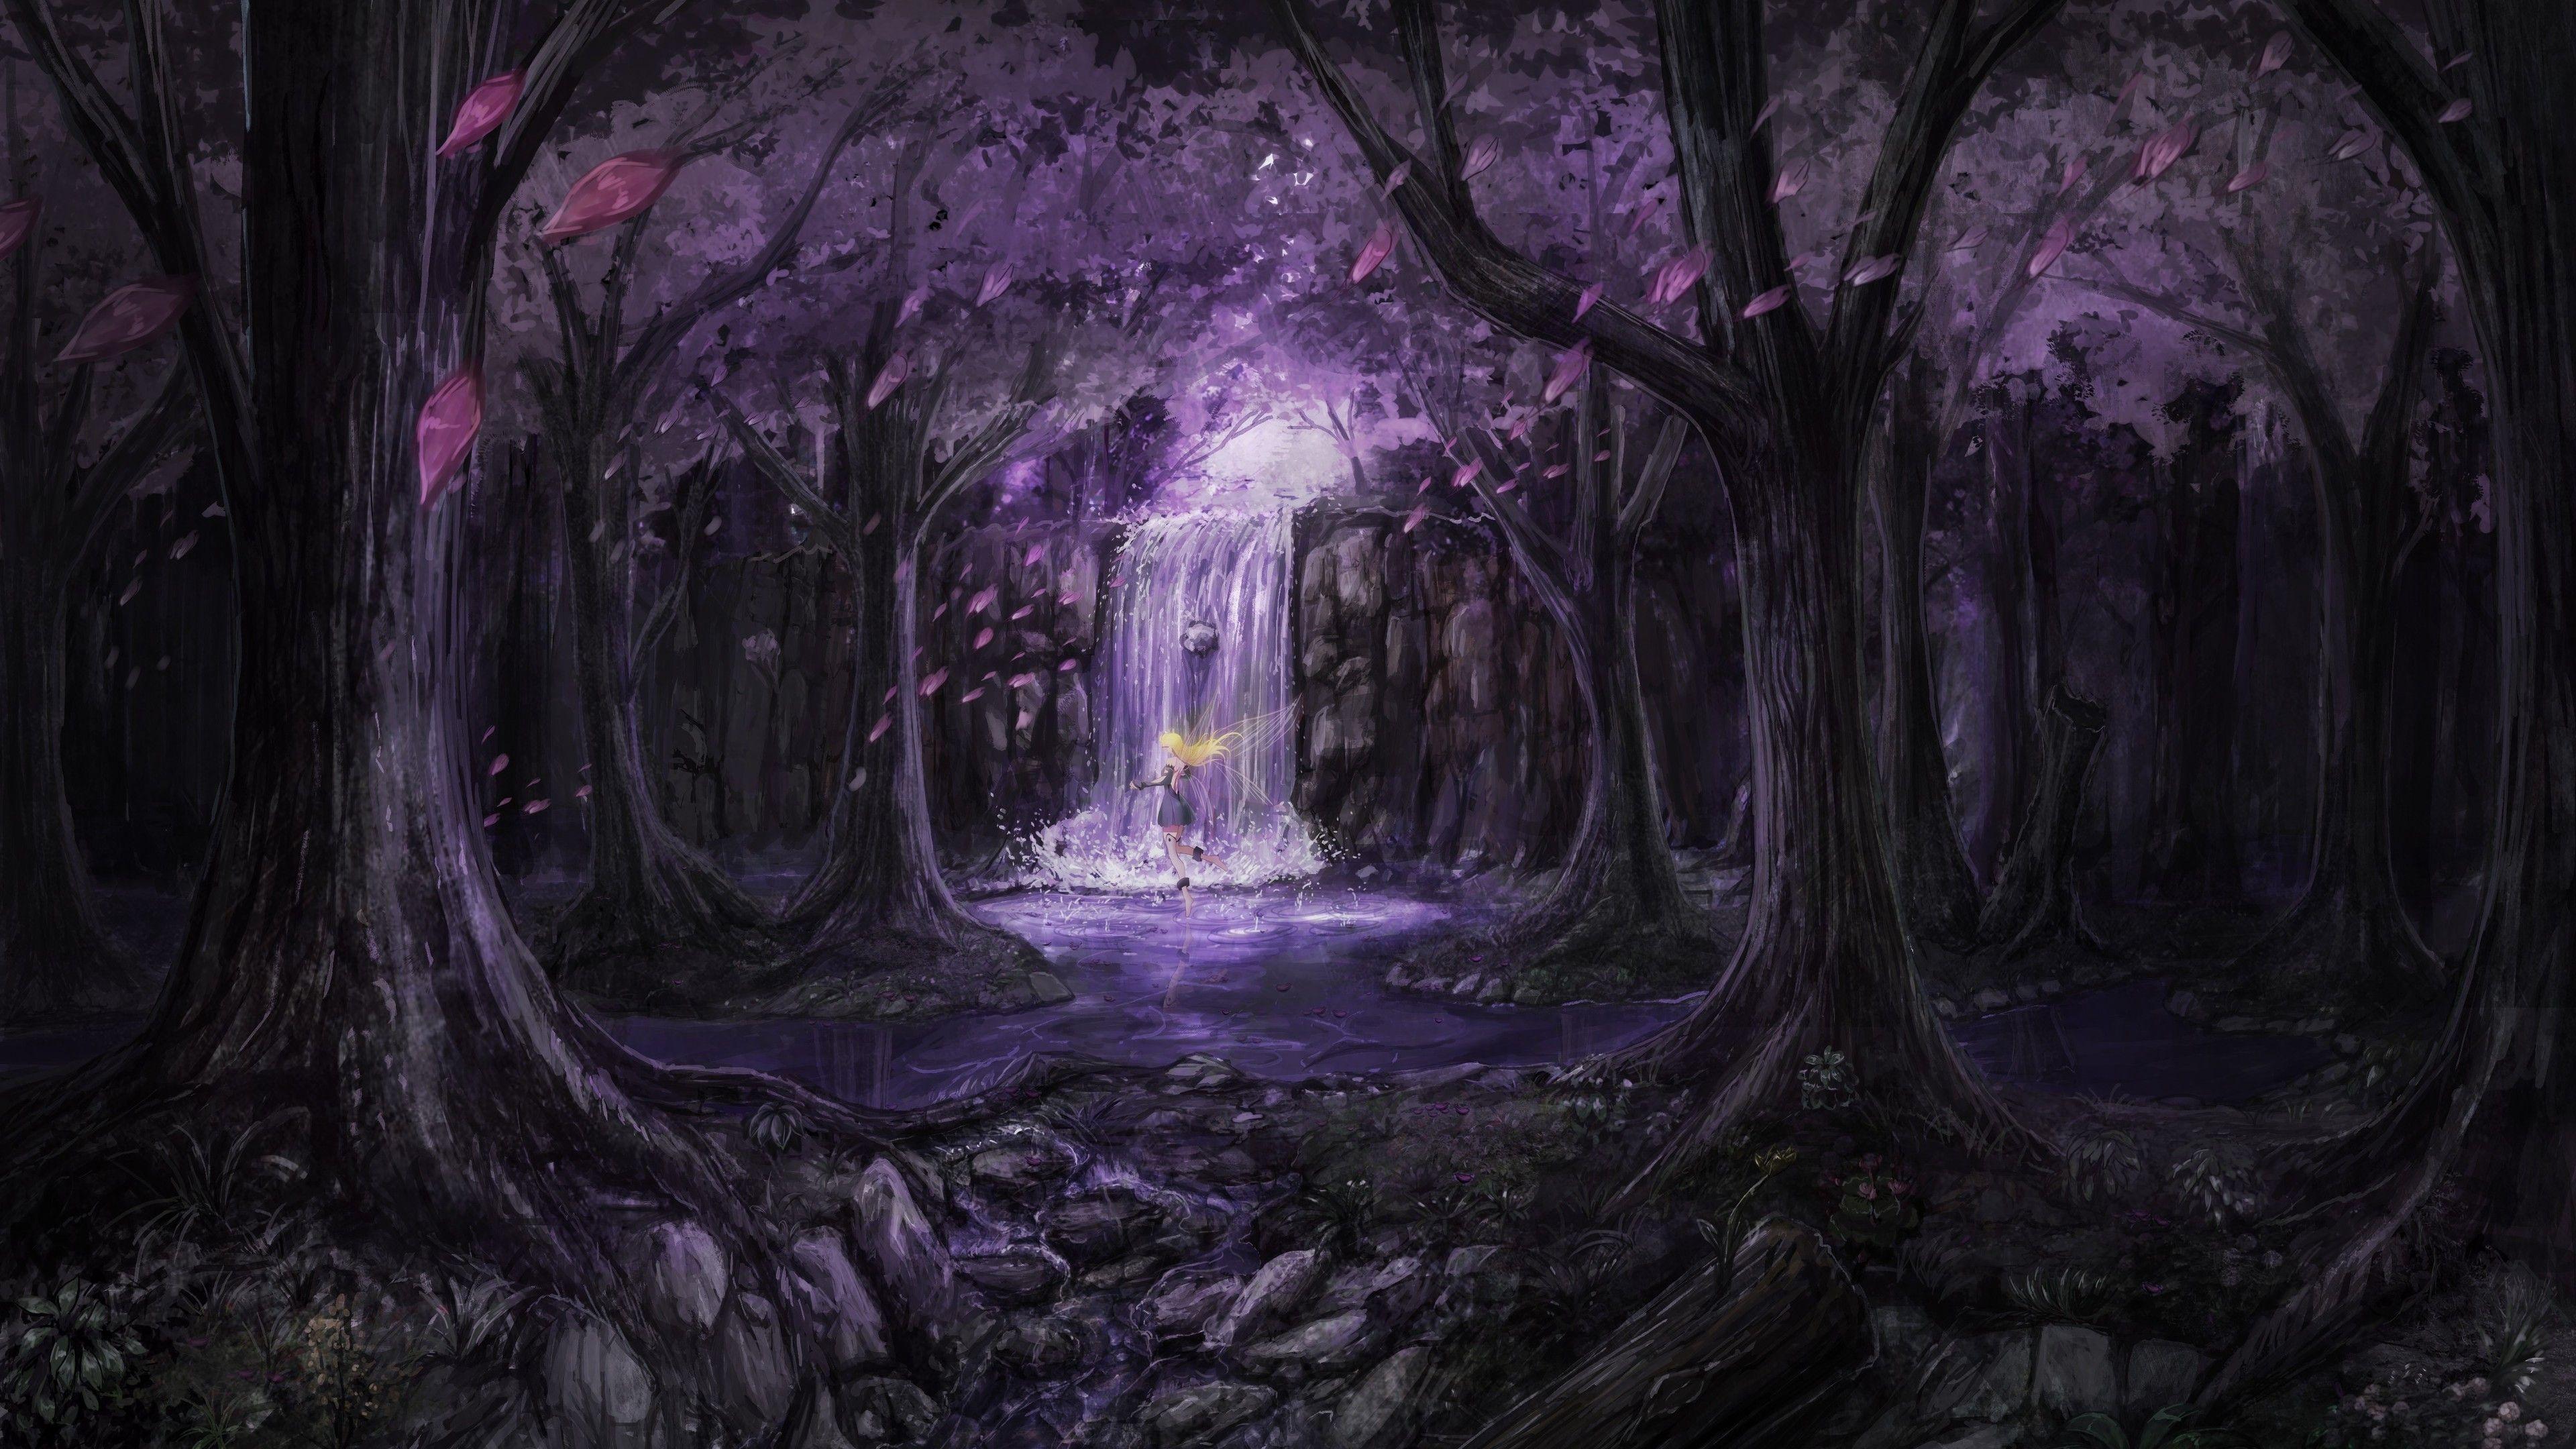 Anime Landscape Trees Dress Fairies 4k Hd Wallpapers Digital Art Wallpapers Artwork Wallpapers Artist Wa Fairy Wallpaper Landscape Wallpaper Anime Wallpaper